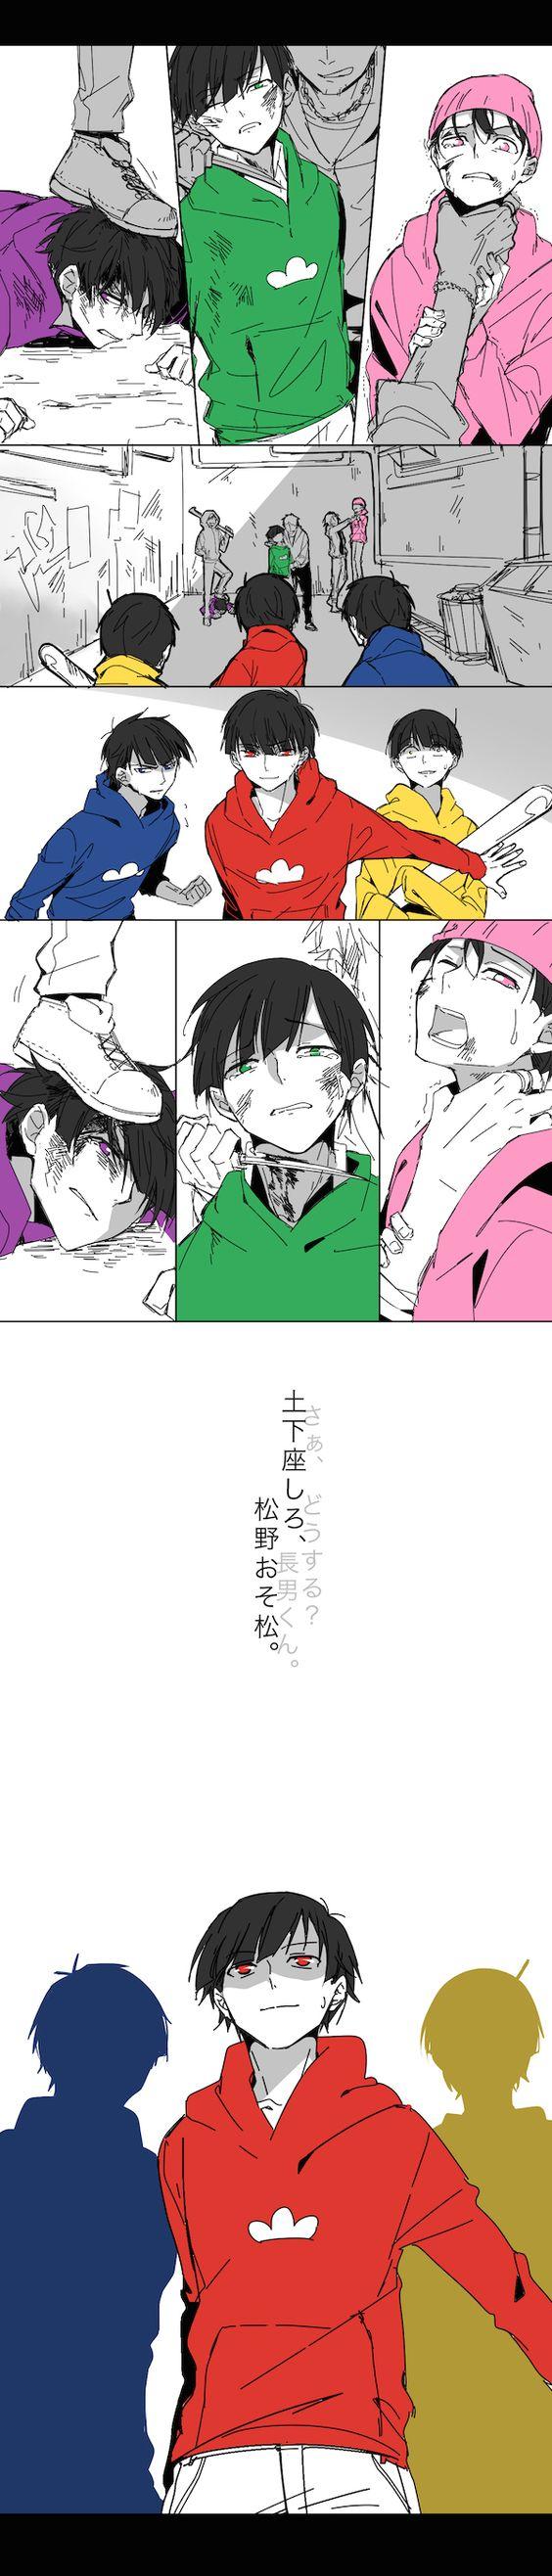 「喧嘩松」/「花✿」の漫画 [pixiv]